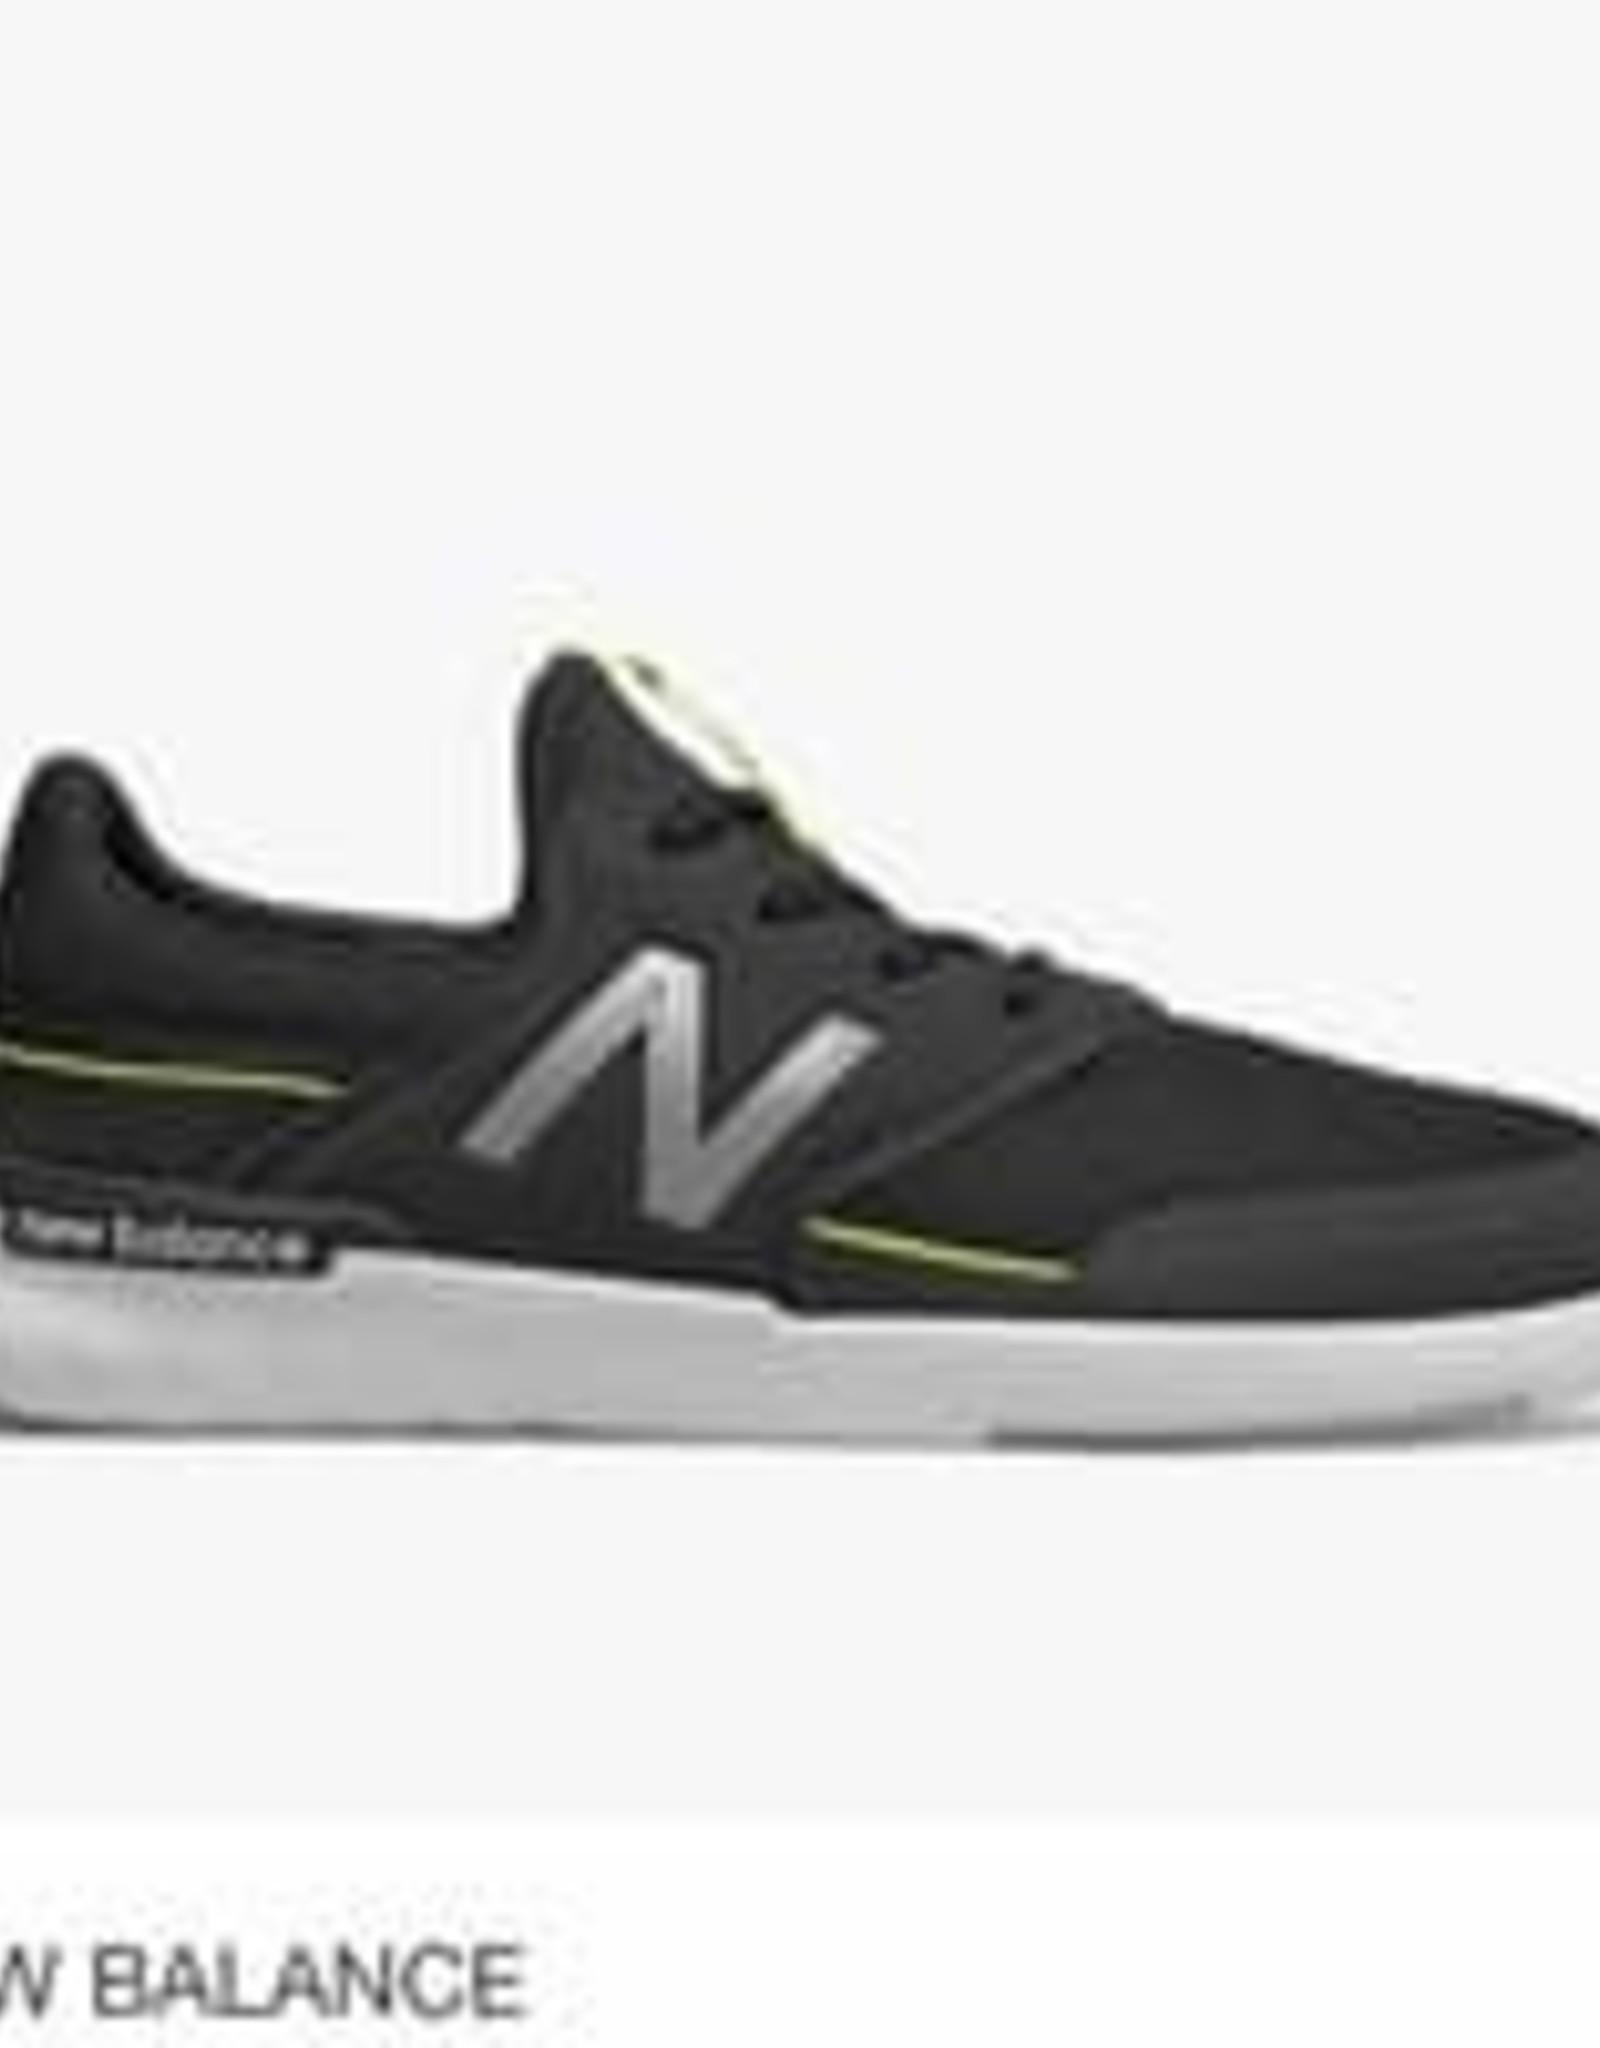 New Balance NB AC 659